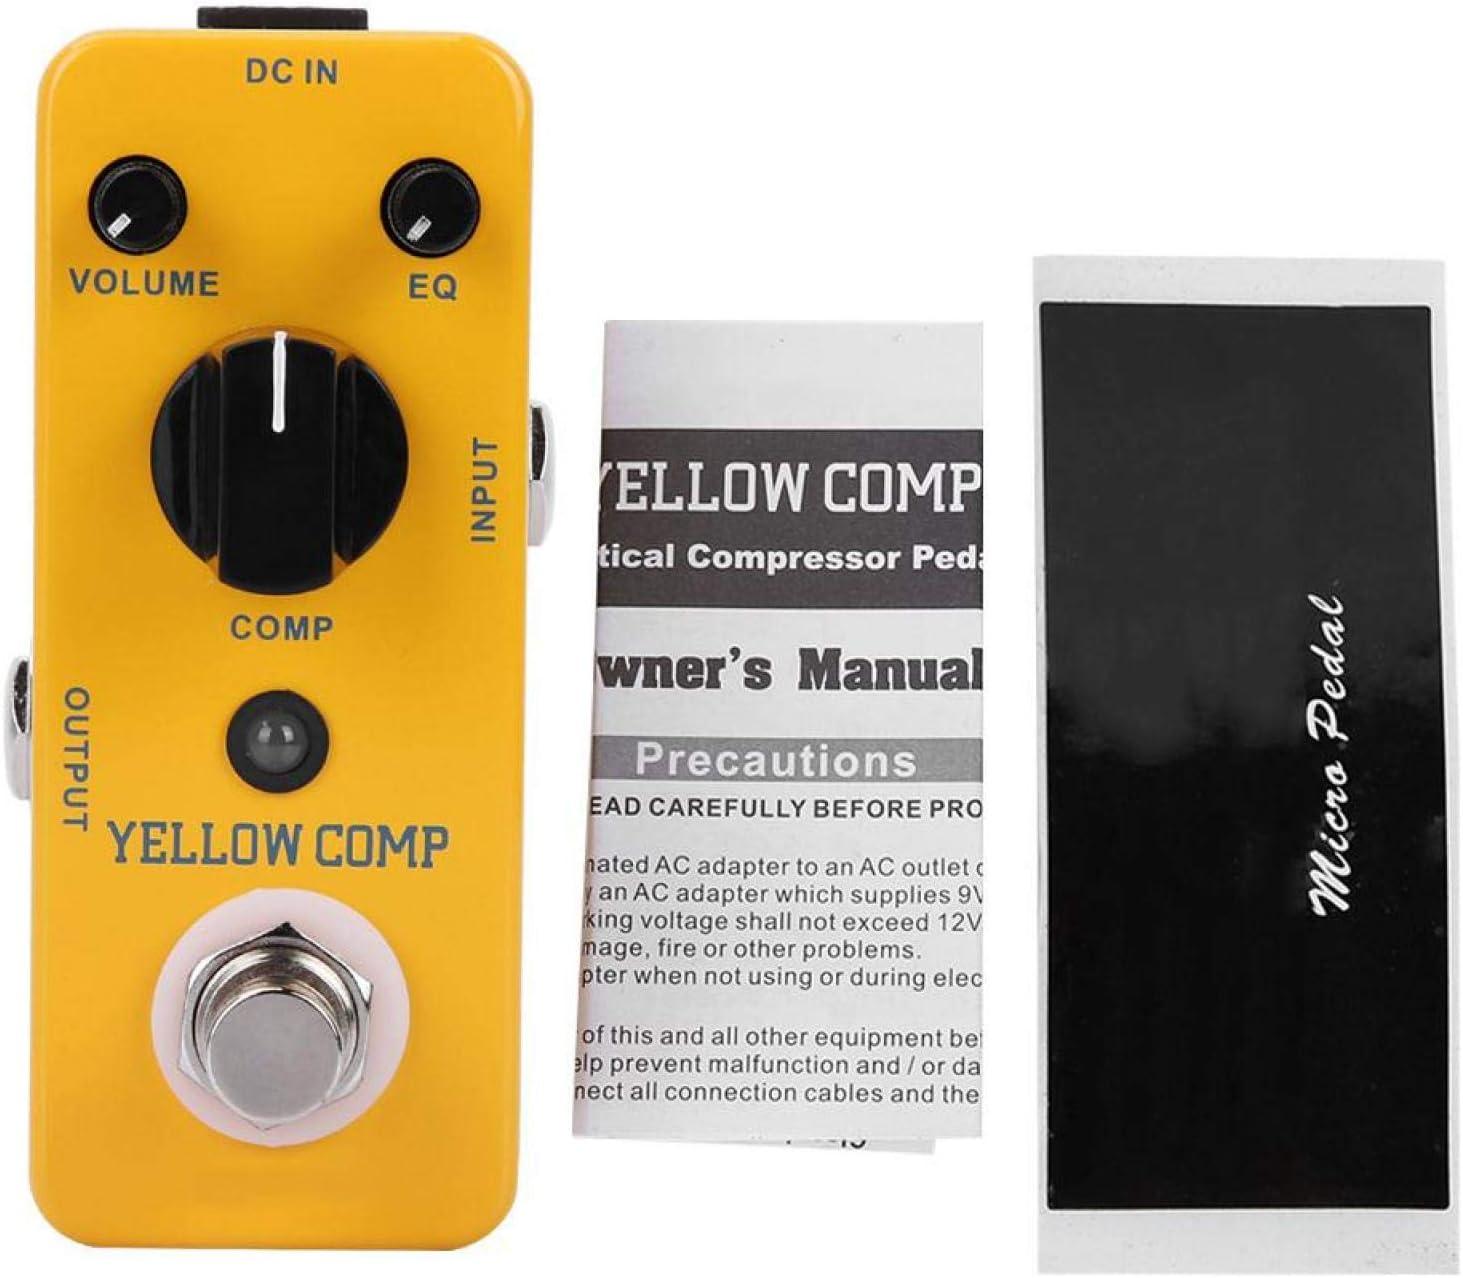 Práctico Compresor de efectos de guitarra Yellow Comp Profesional de efectos de guitarra para guitarrista para práctica